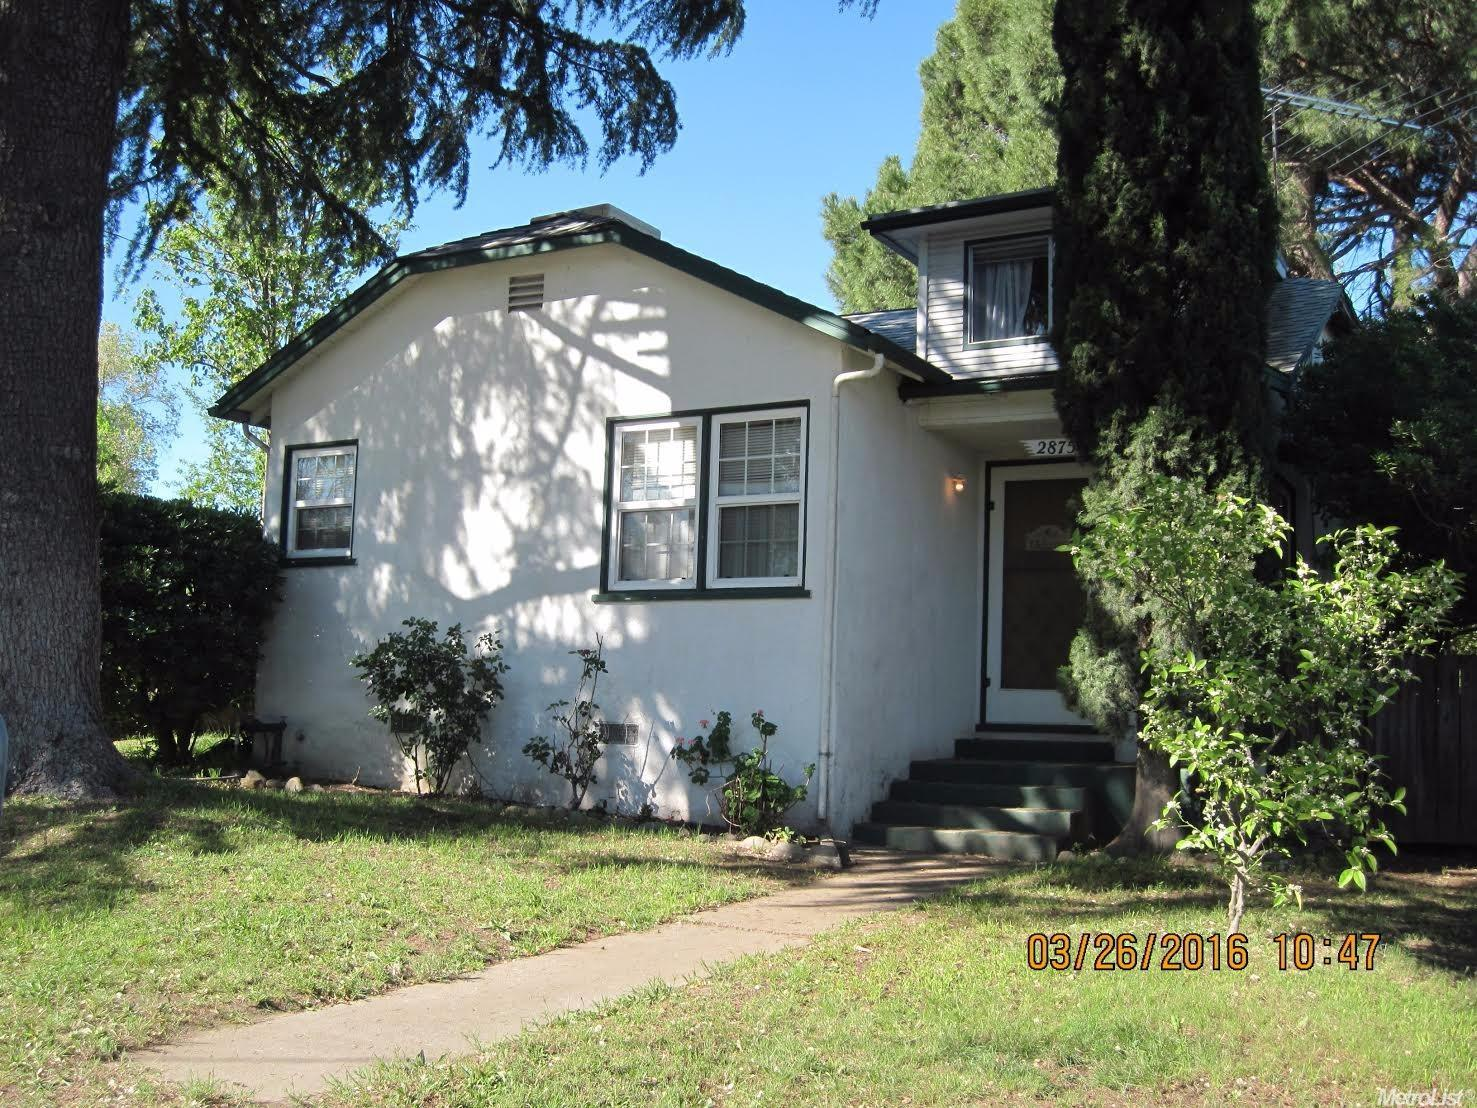 2875 Perktel St, Sacramento, CA